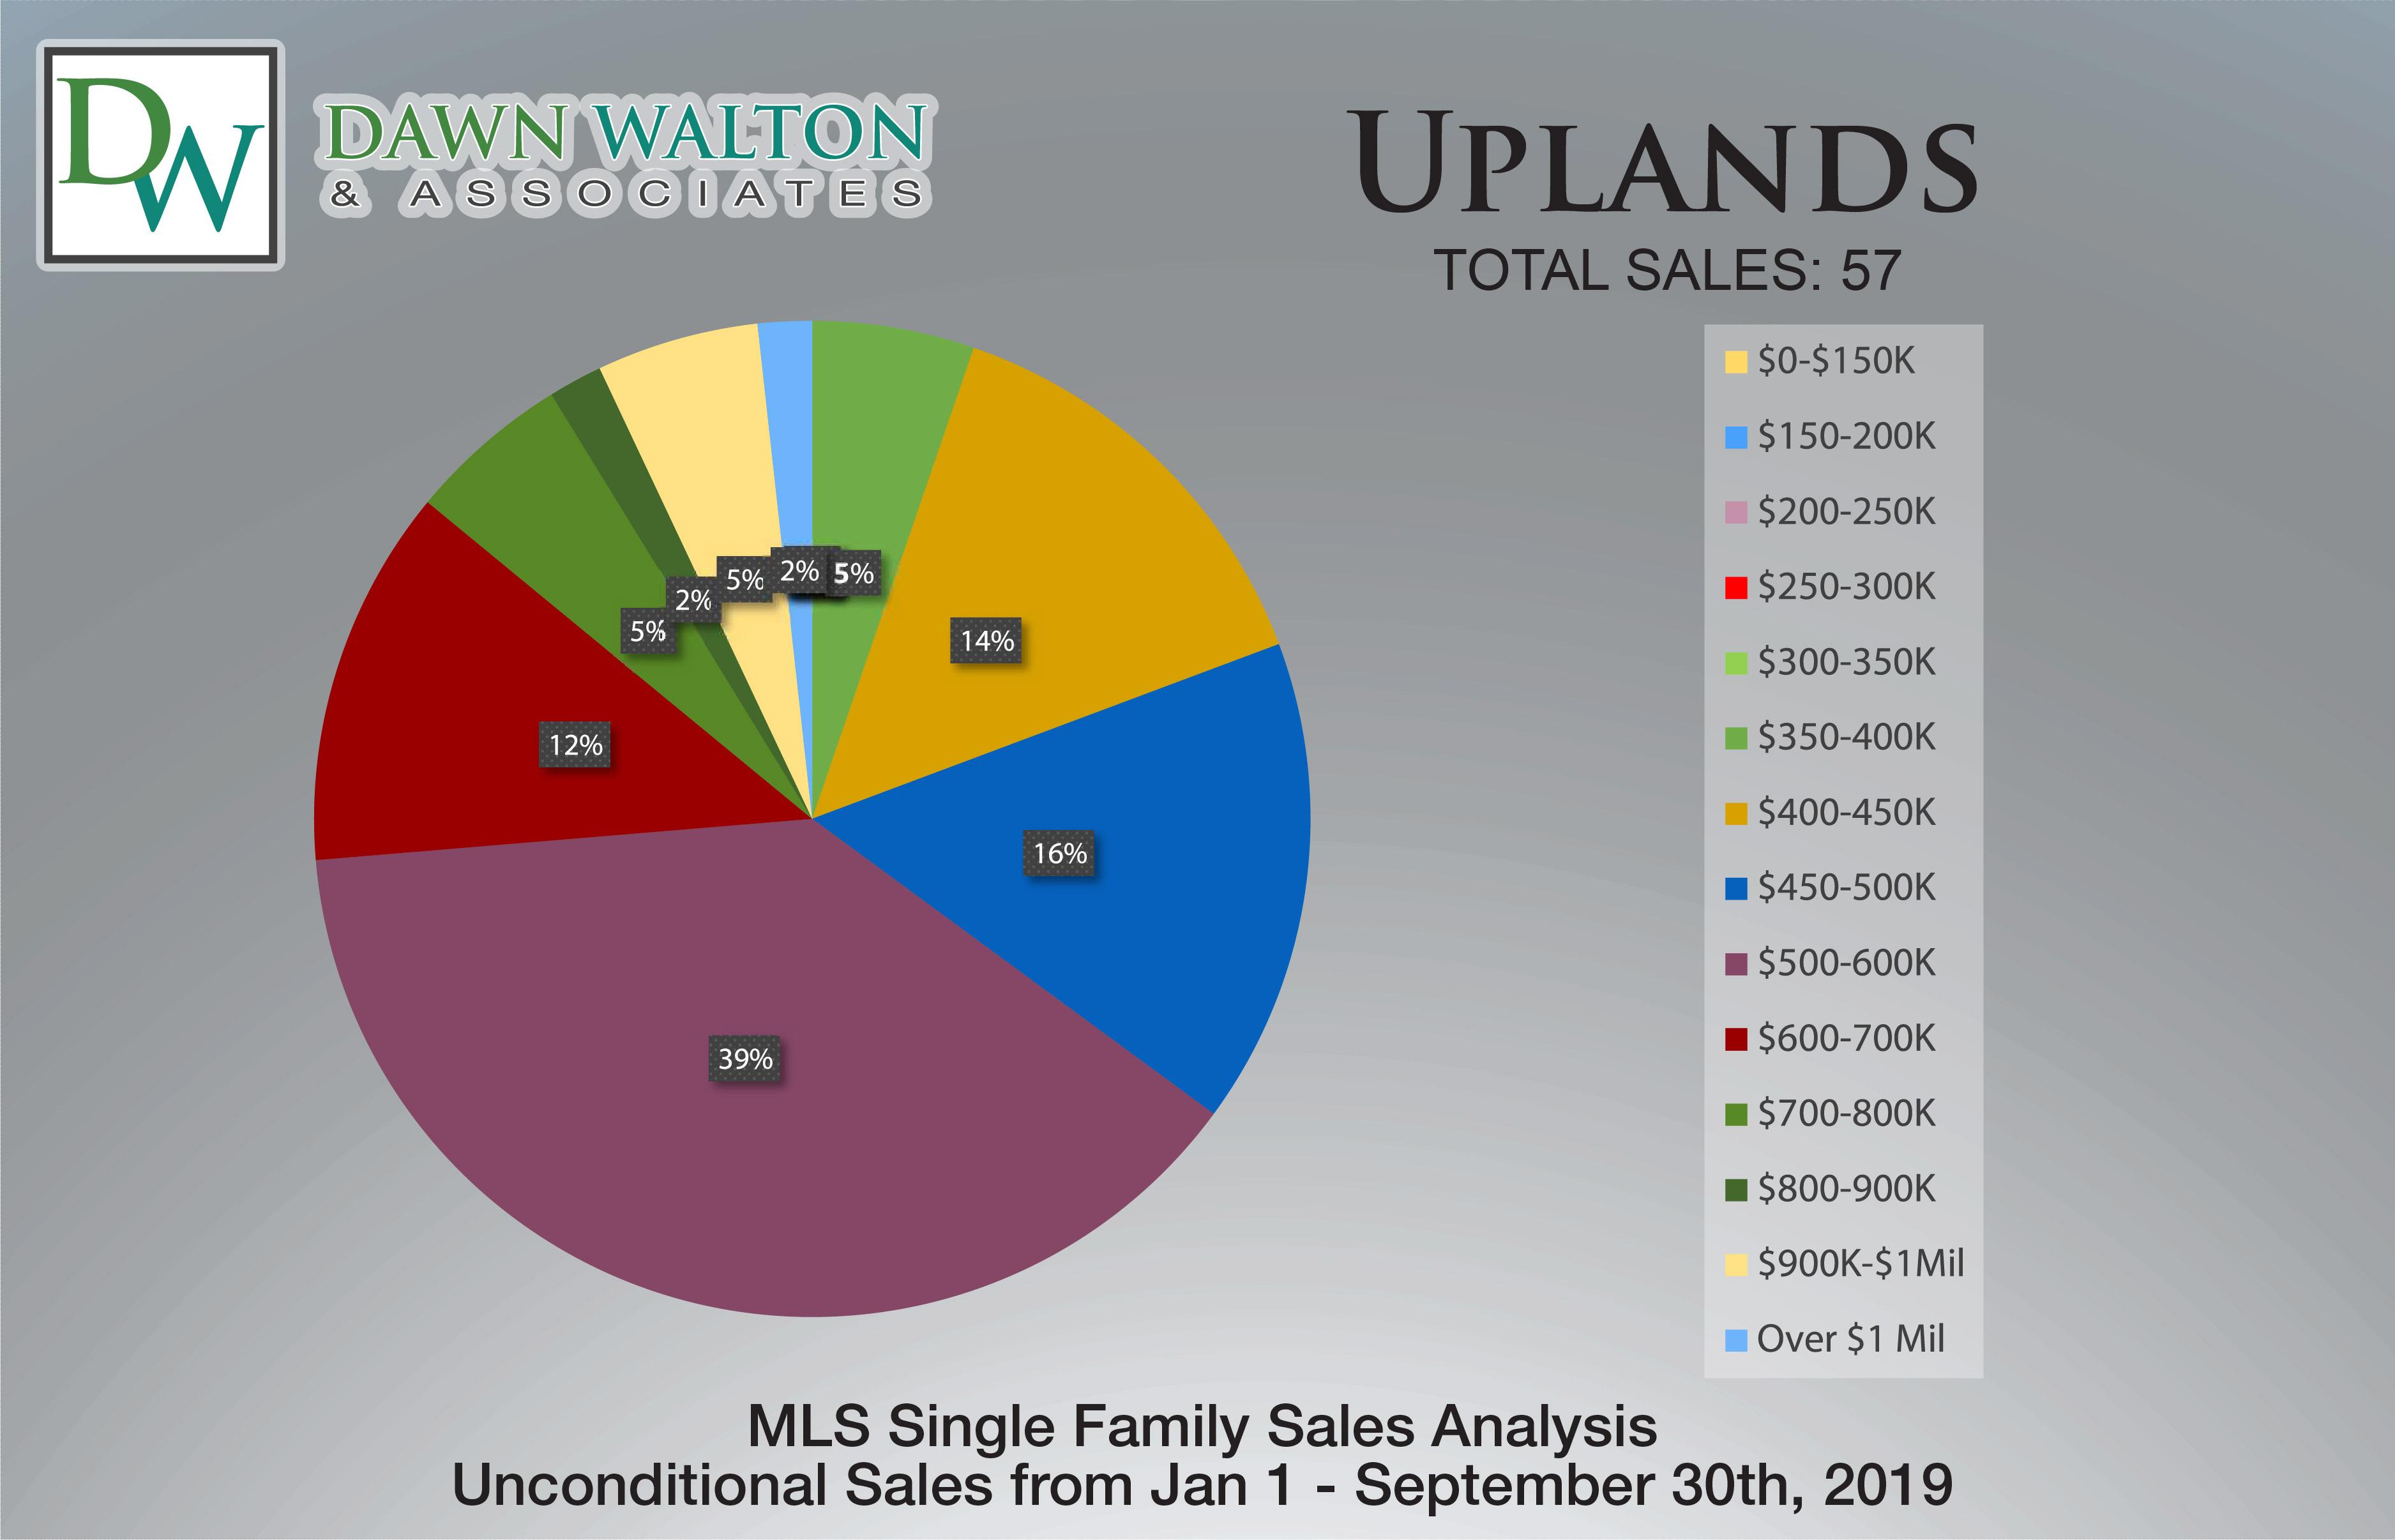 Uplands Real Estate Market Stats Price Percentage Jan 1-Sept 30 2019 - Nanaimo Realtor Dawn Walton